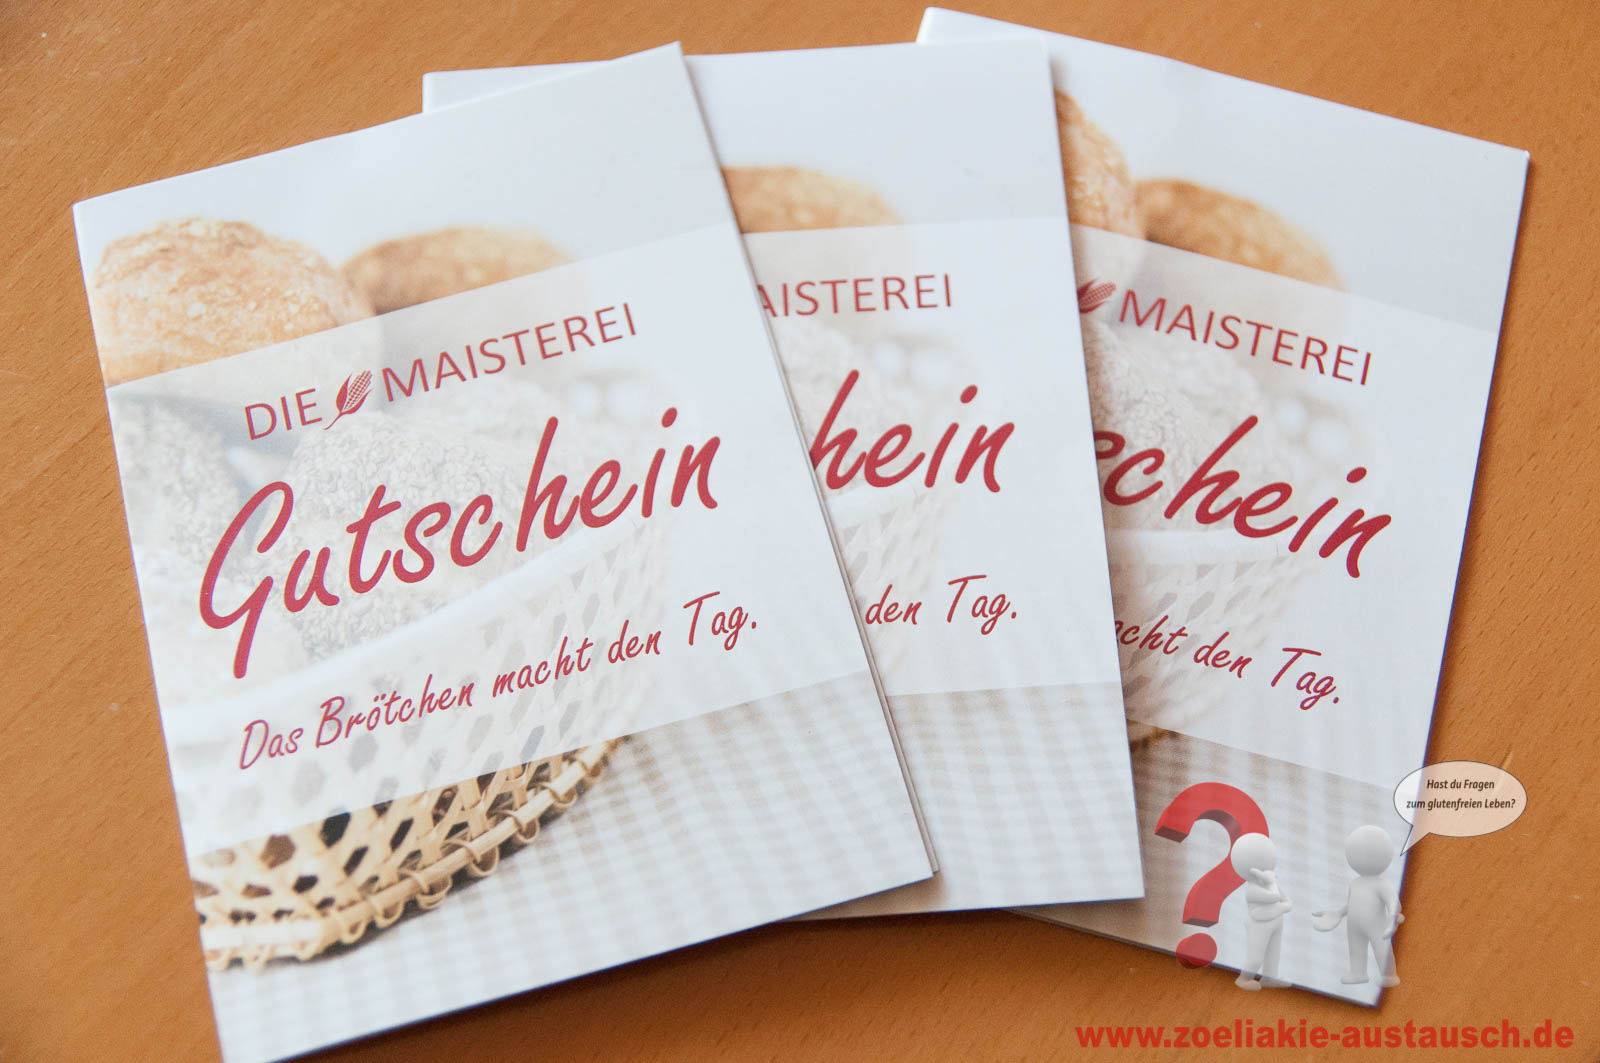 Zoeliakie-Austausch_Maisterei_50